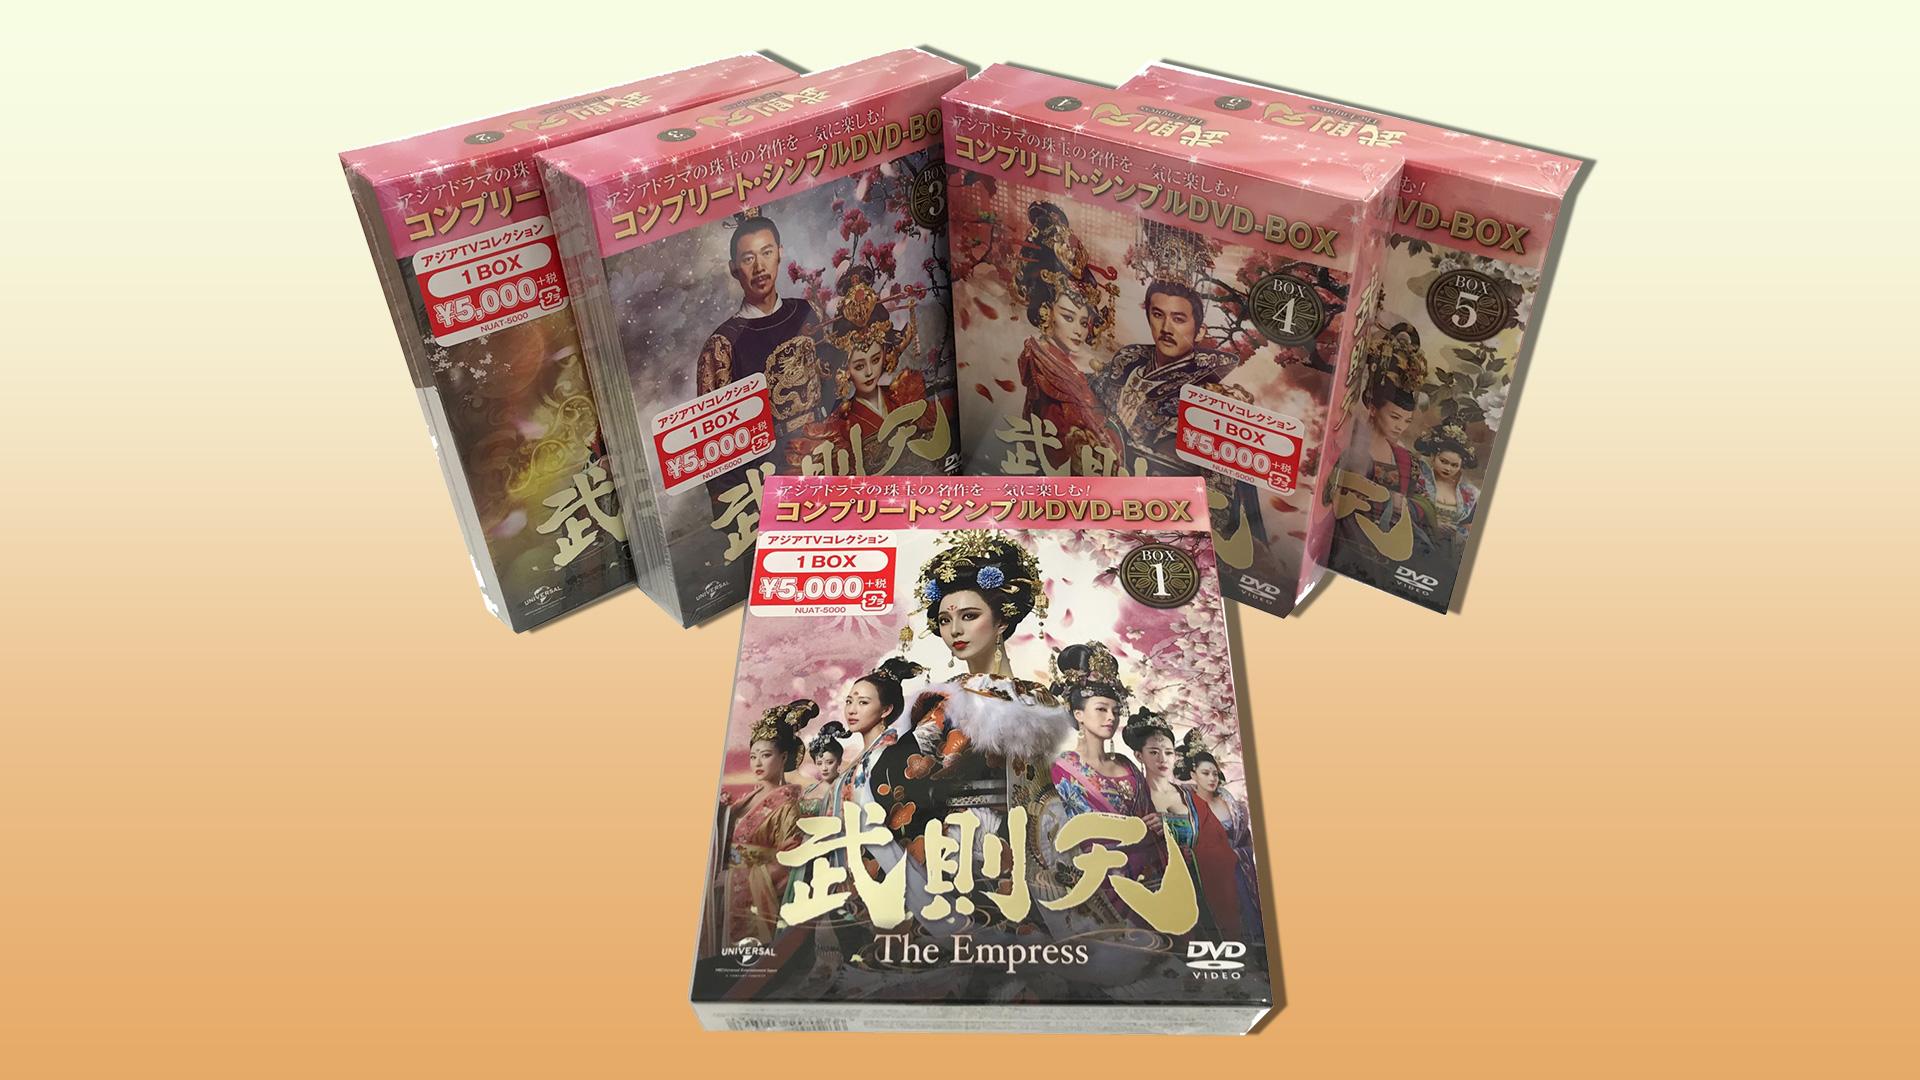 ②中国時代劇「武則天-The Empress-」DVDBOX 1~5セット 1名様